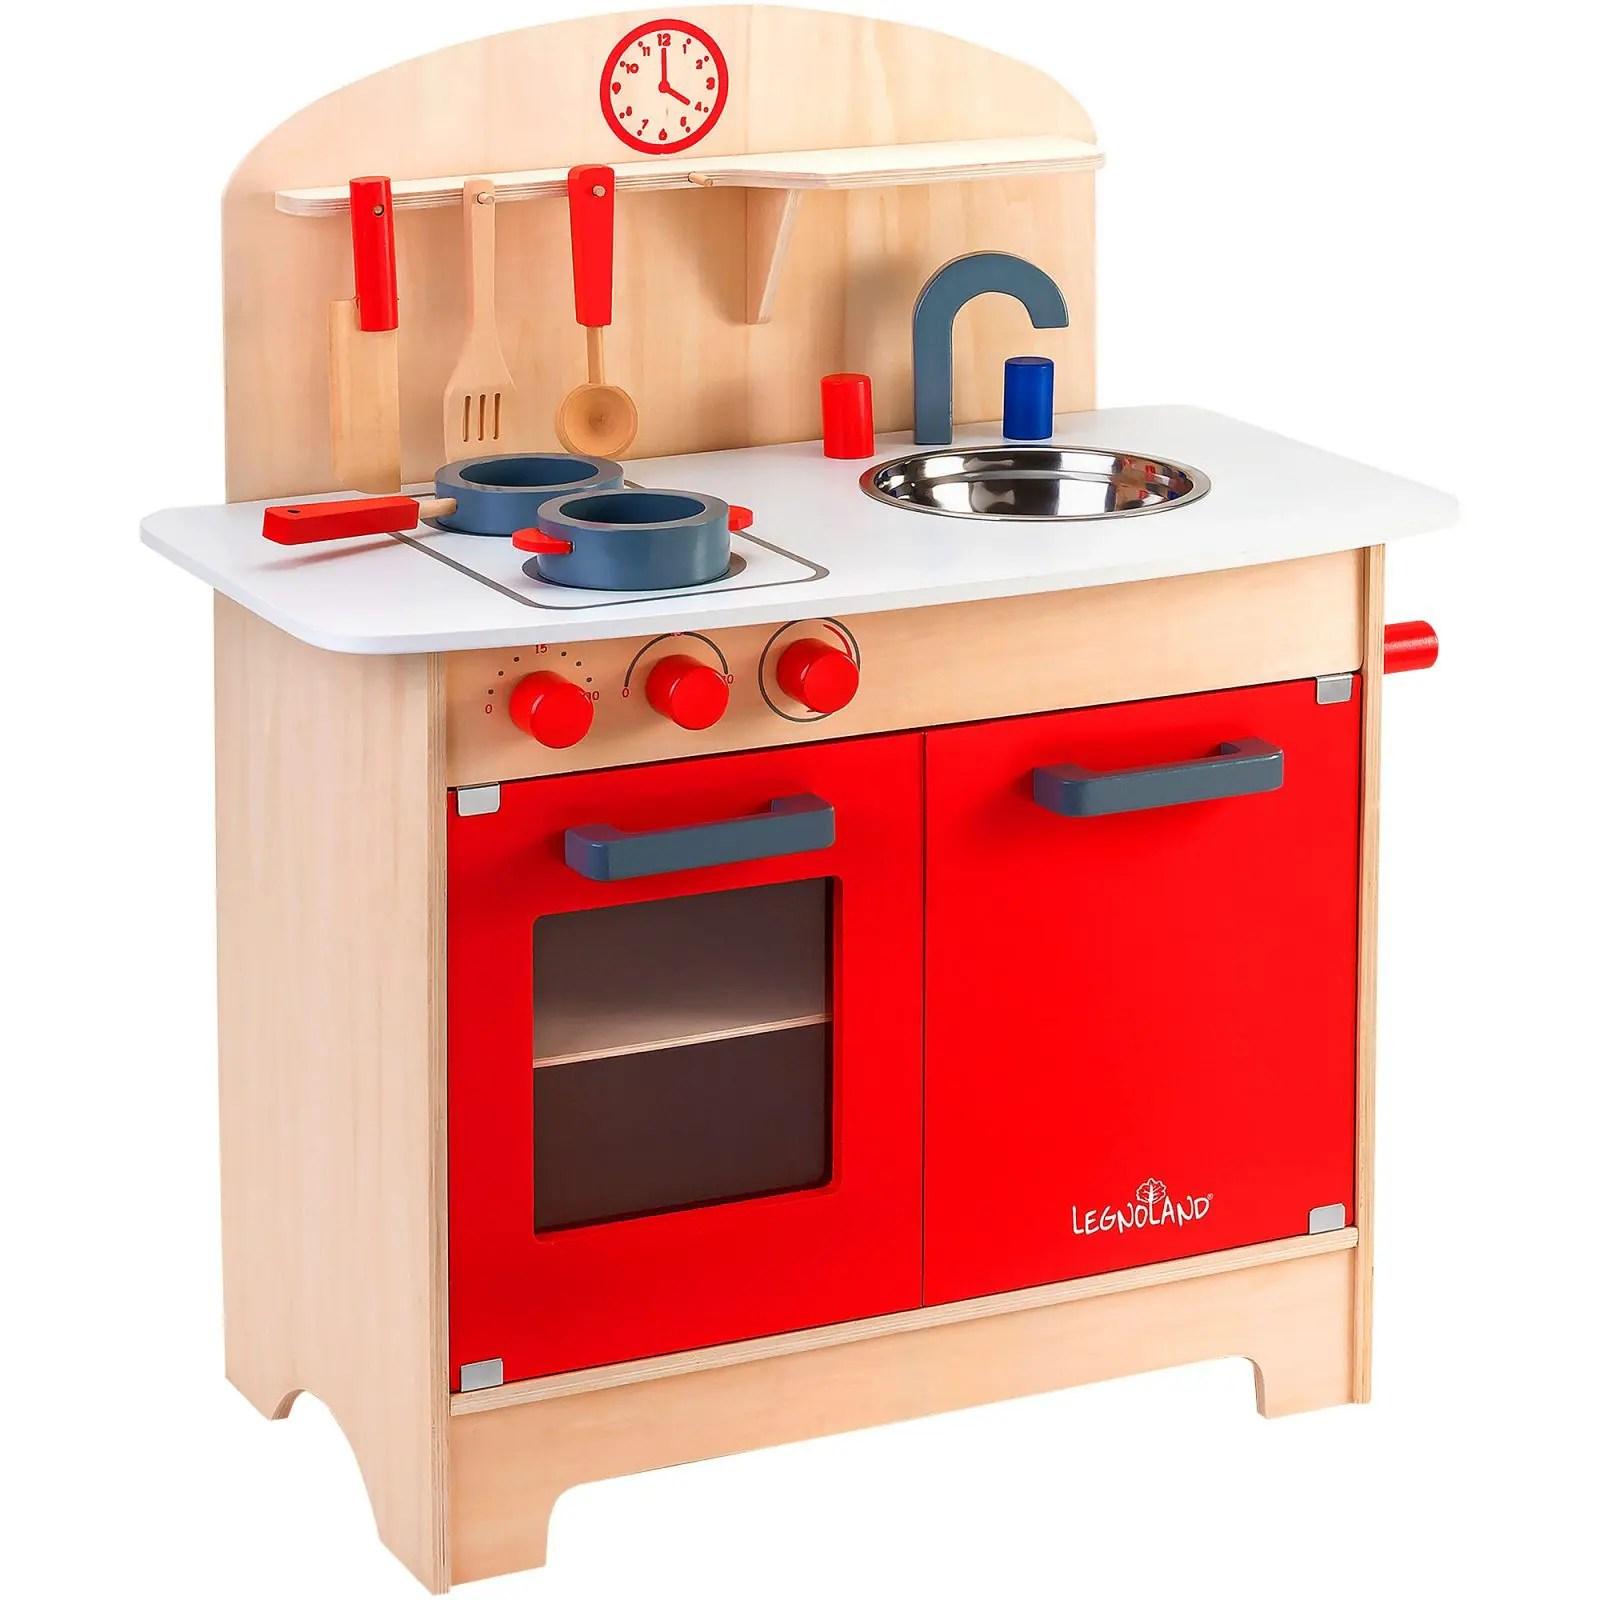 Cucina X Bambini In Legno   Costruire Cucina In Legno Per Bambini